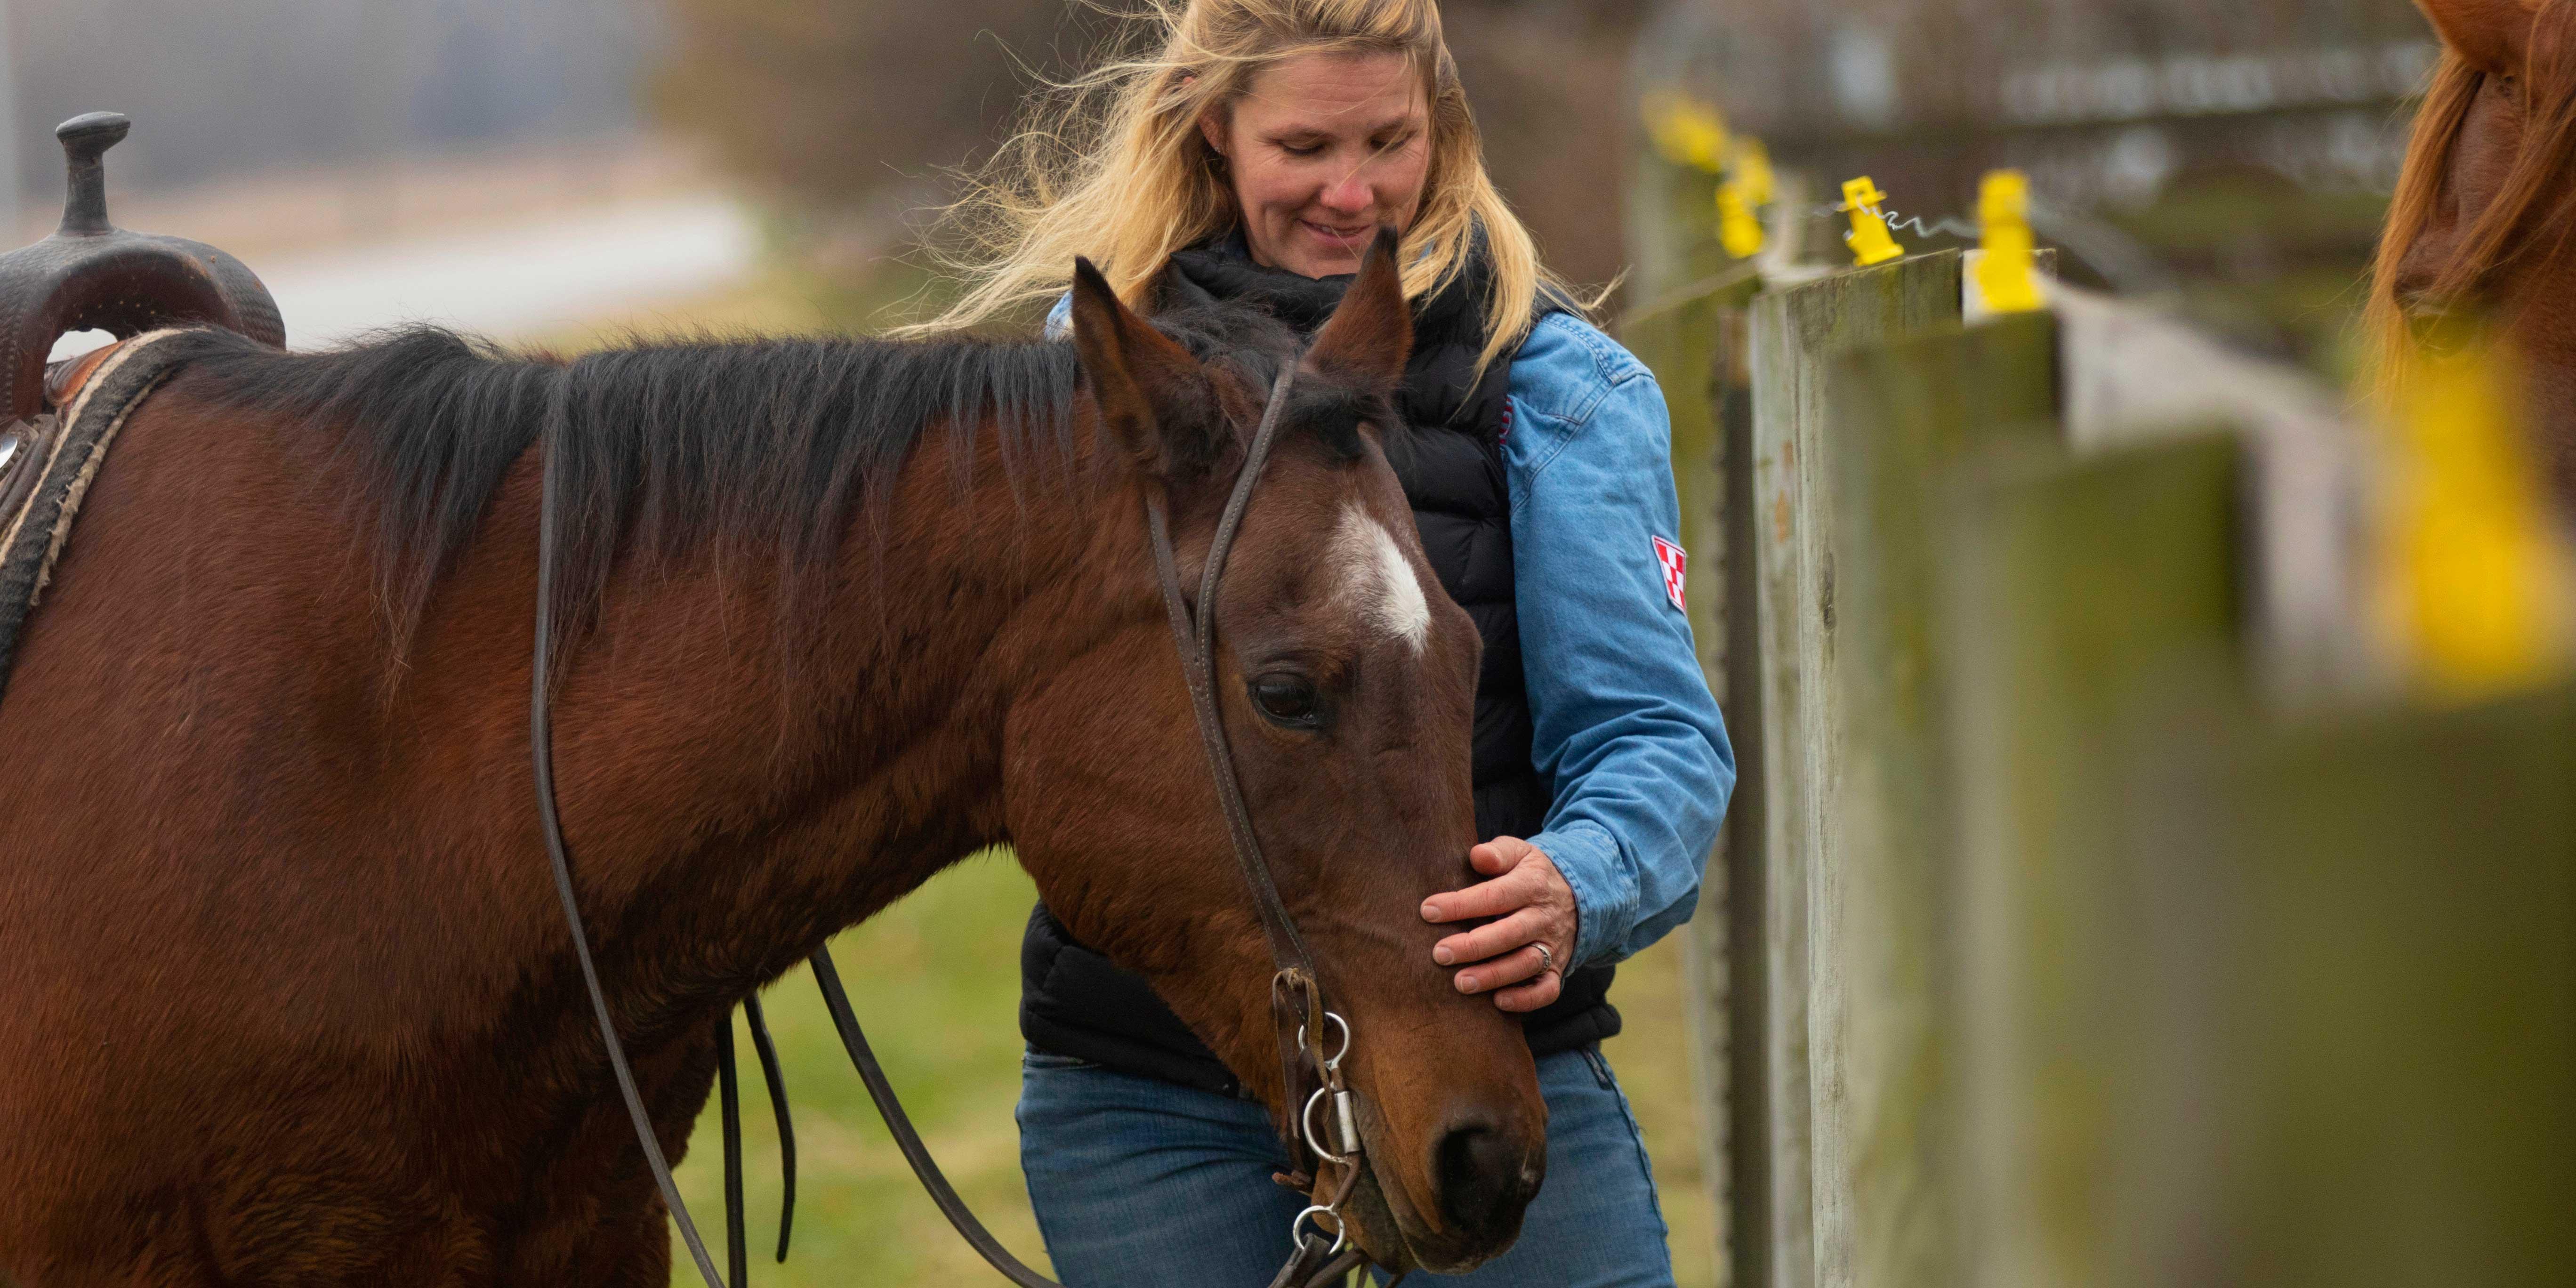 USD alumna Meggan Hill-McQueeny with horse